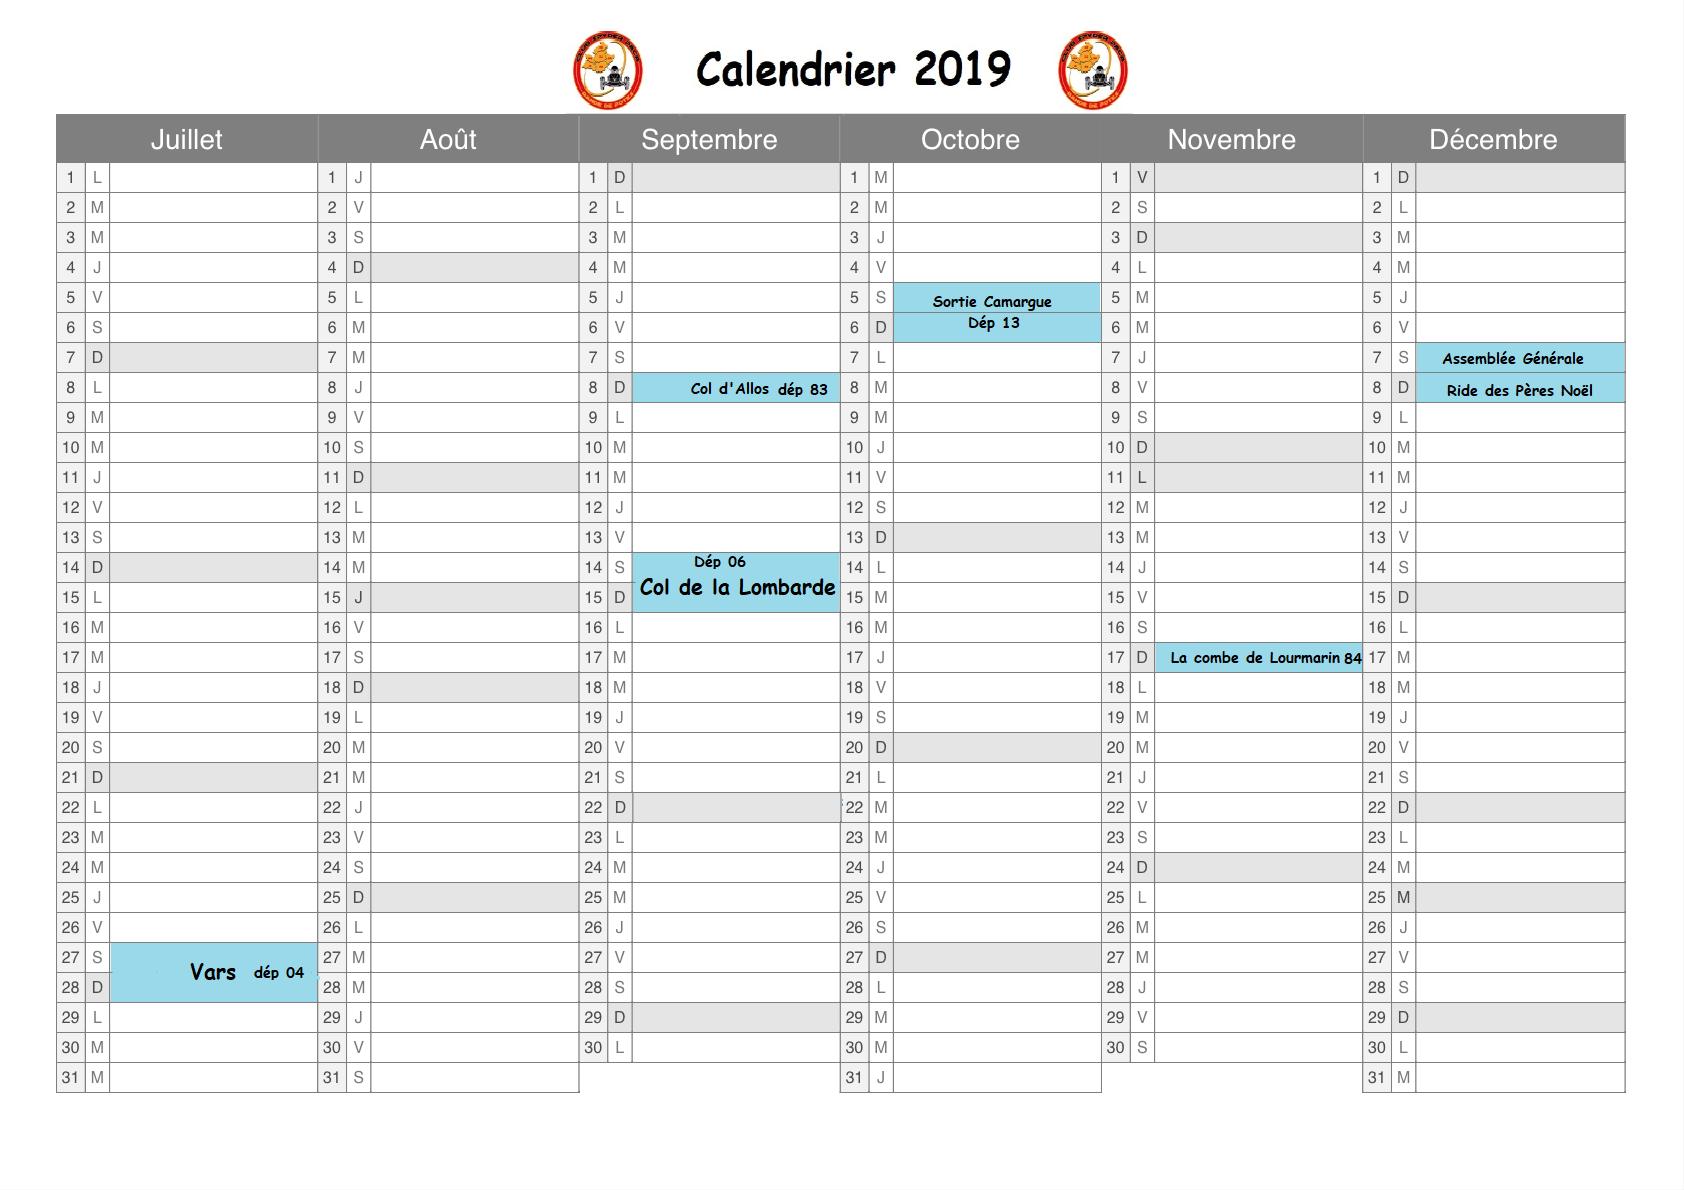 Calendrier 2019 2ème semestre